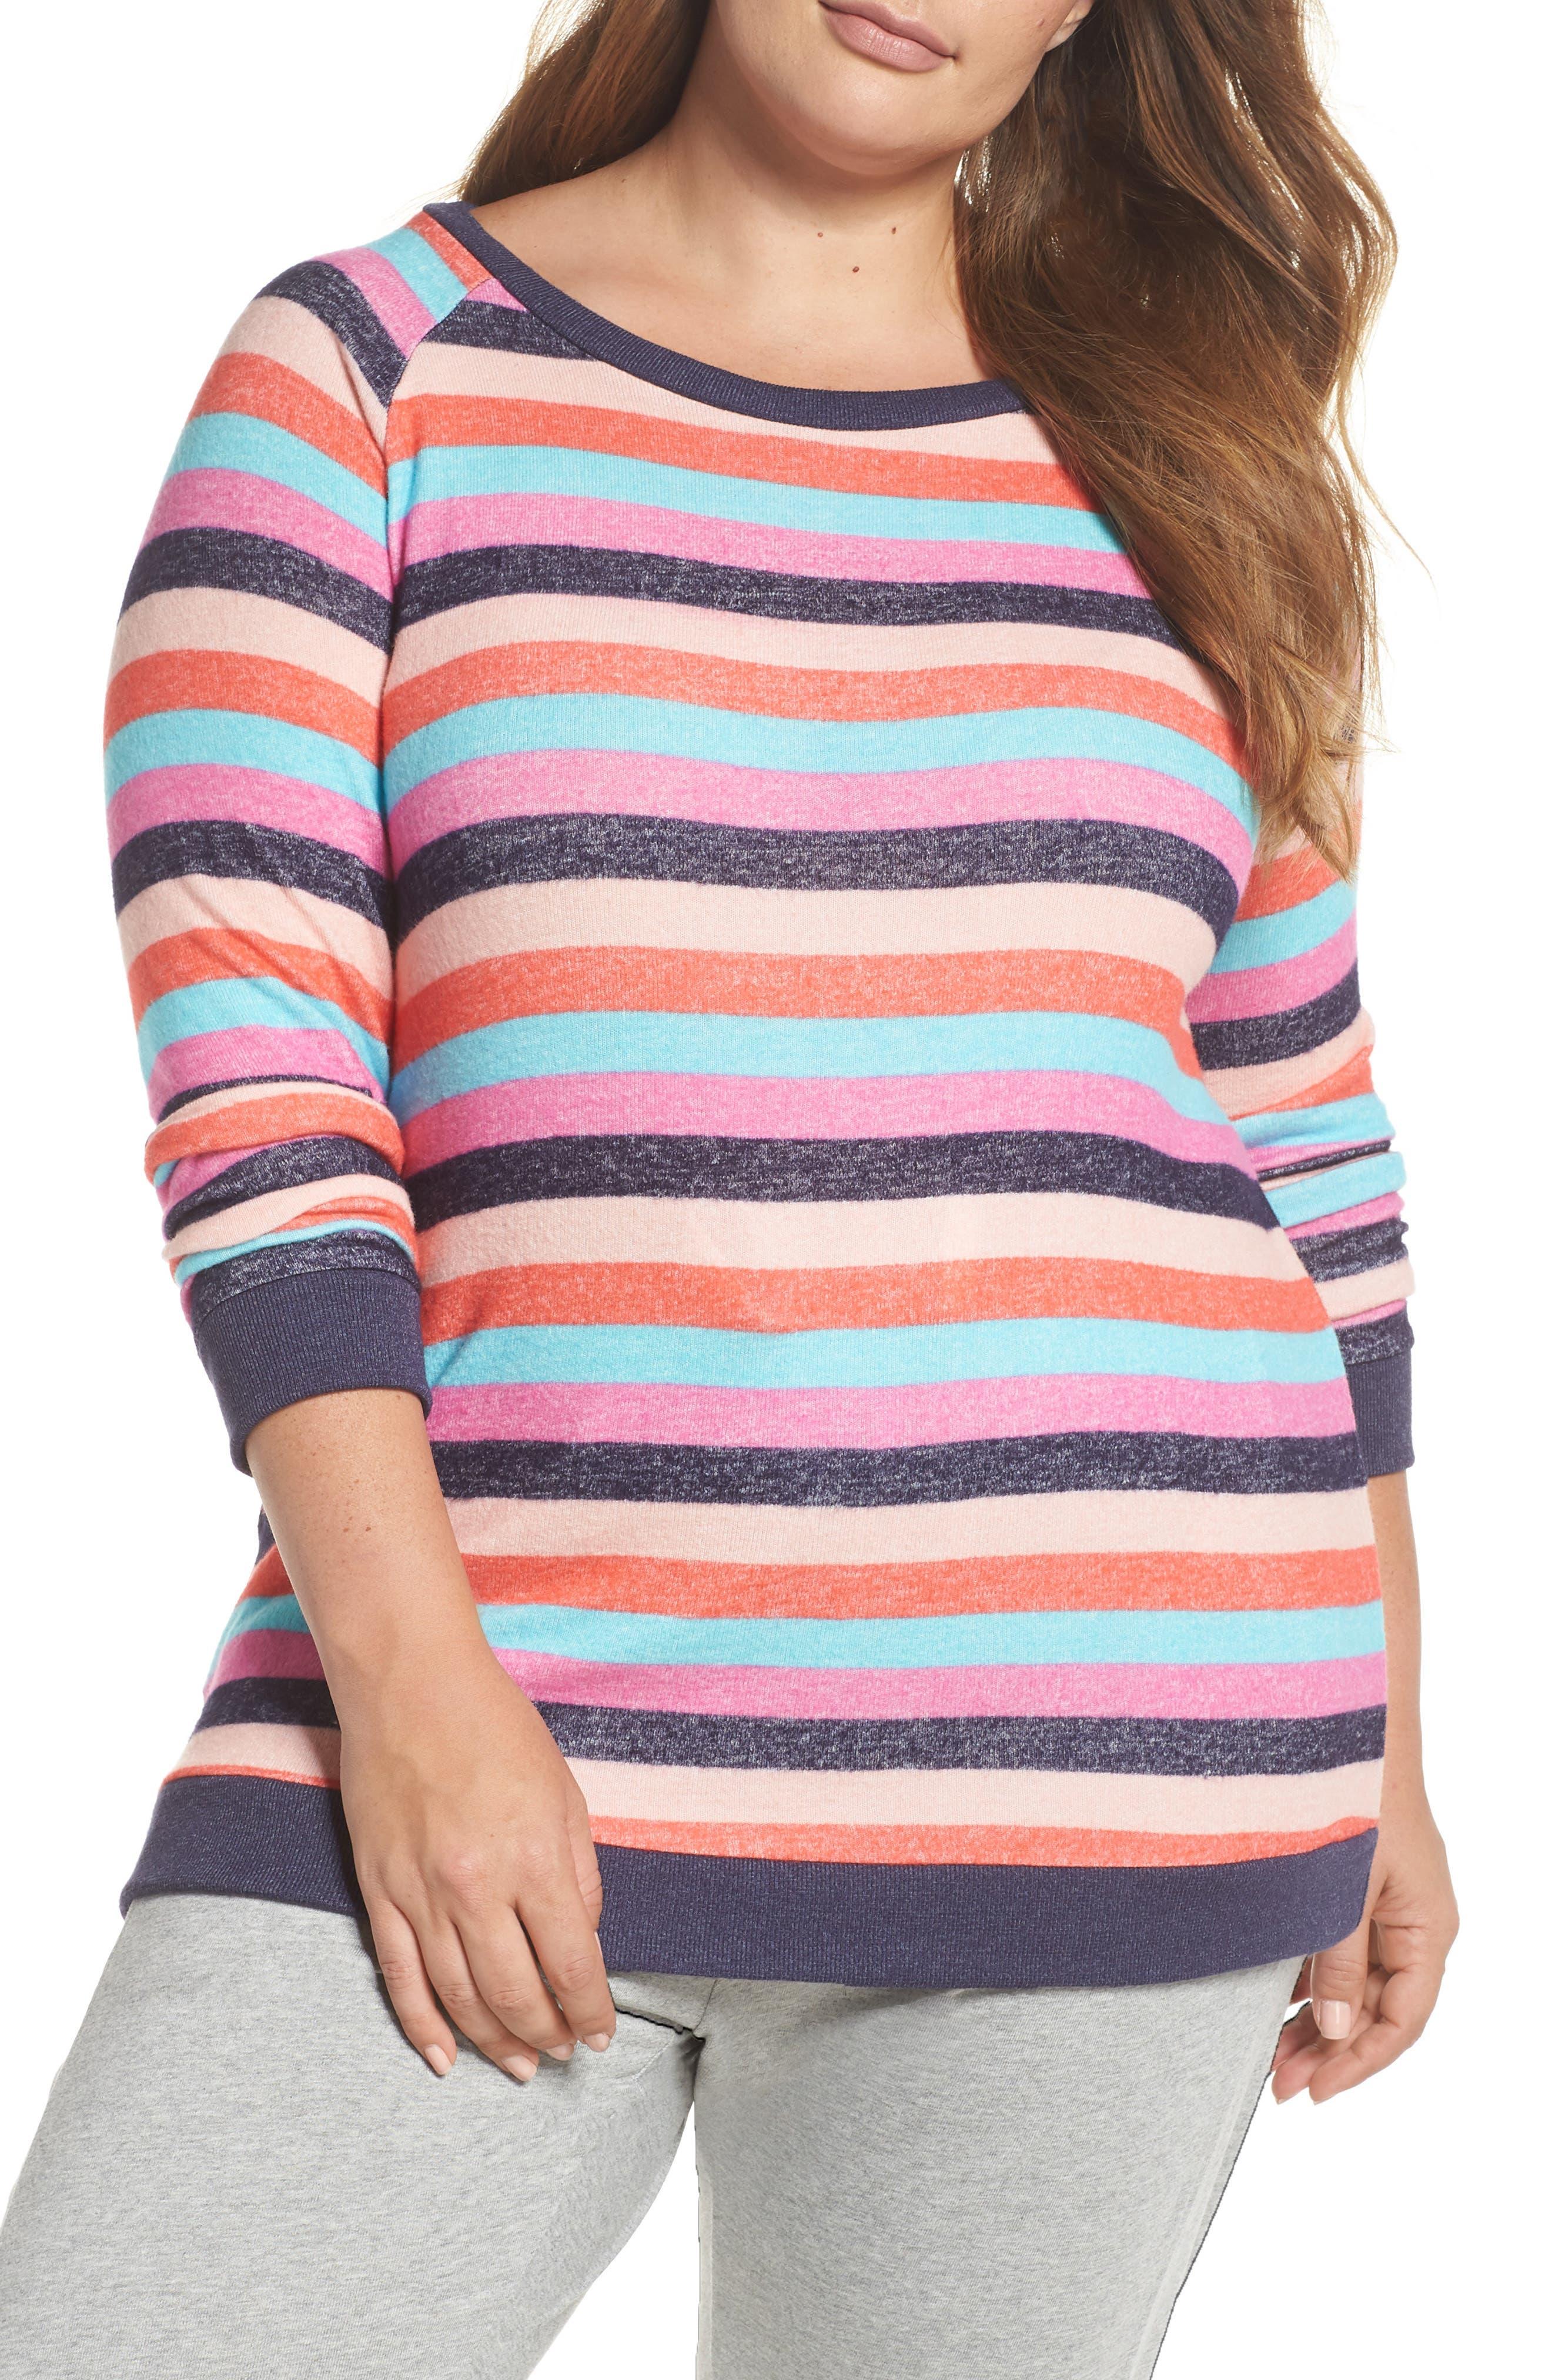 Cozy Crew Lounge Sweater,                             Main thumbnail 1, color,                             Navy Dusk Milli Multi Stripe